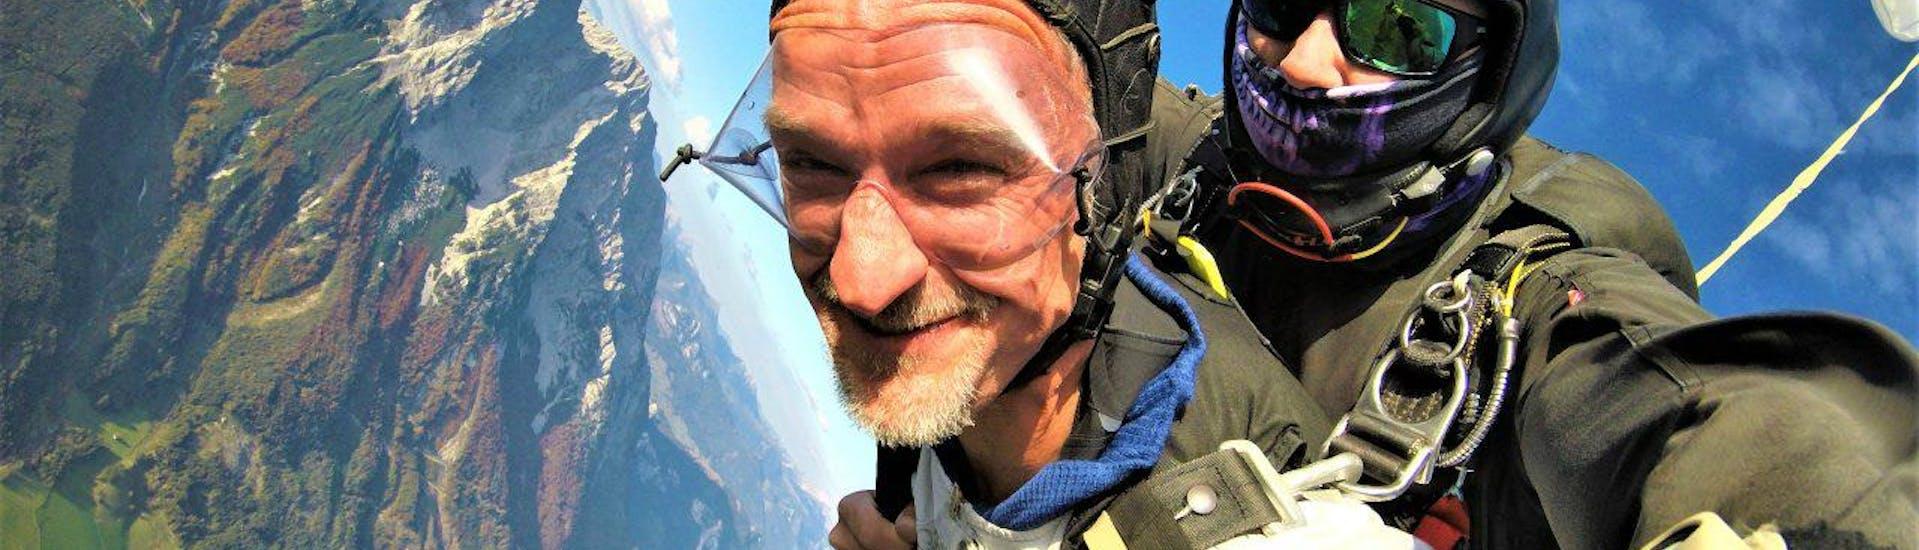 Tandem Skydive from 6000m - Niederöblarn